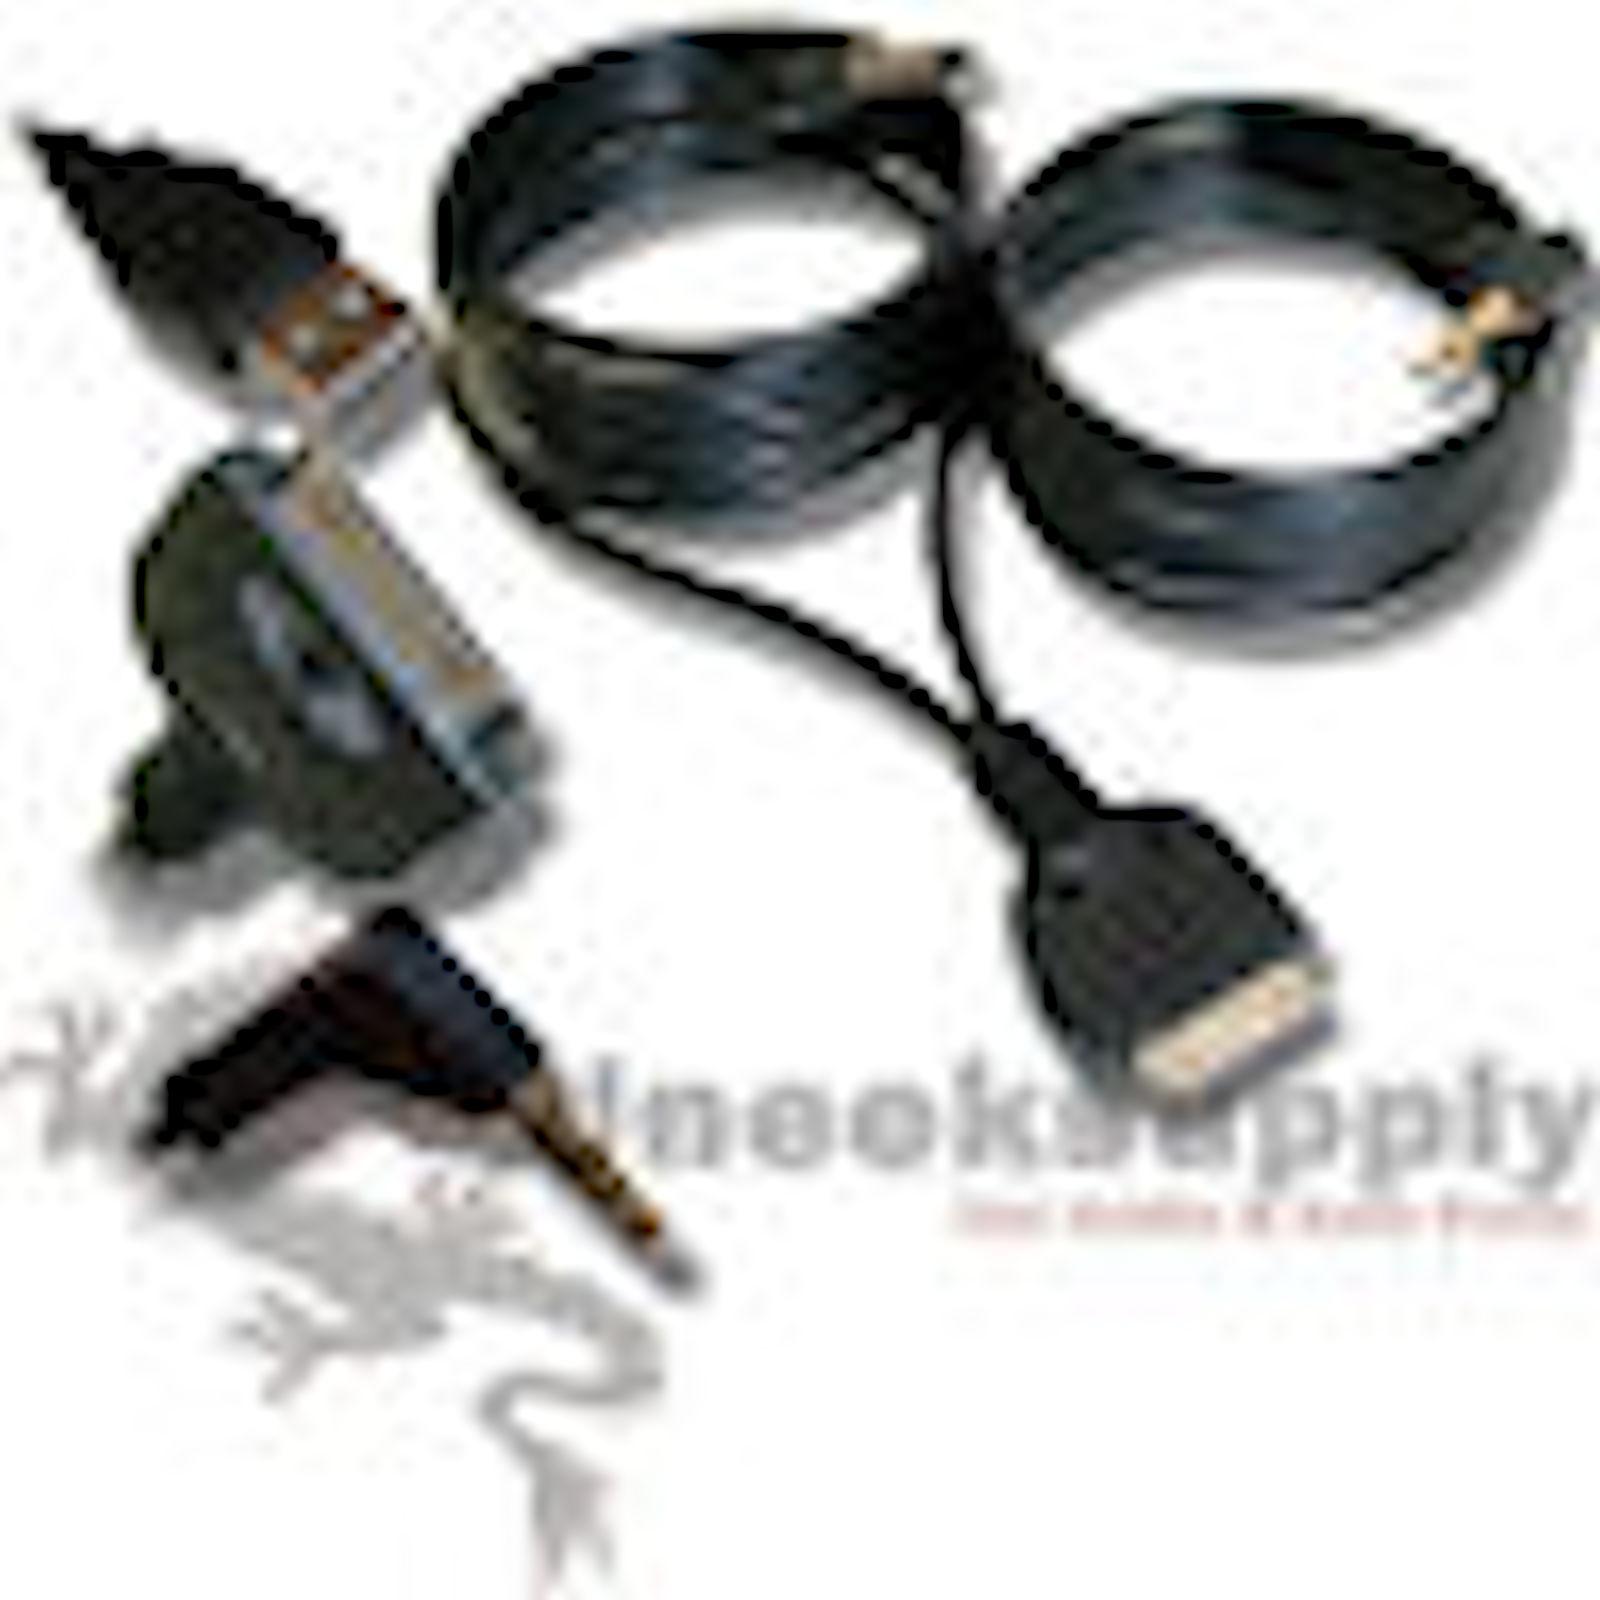 Uv10 Wiring Diagram Jensen Phase Linear Uv10 Wiring Jensen Uv10 Wire